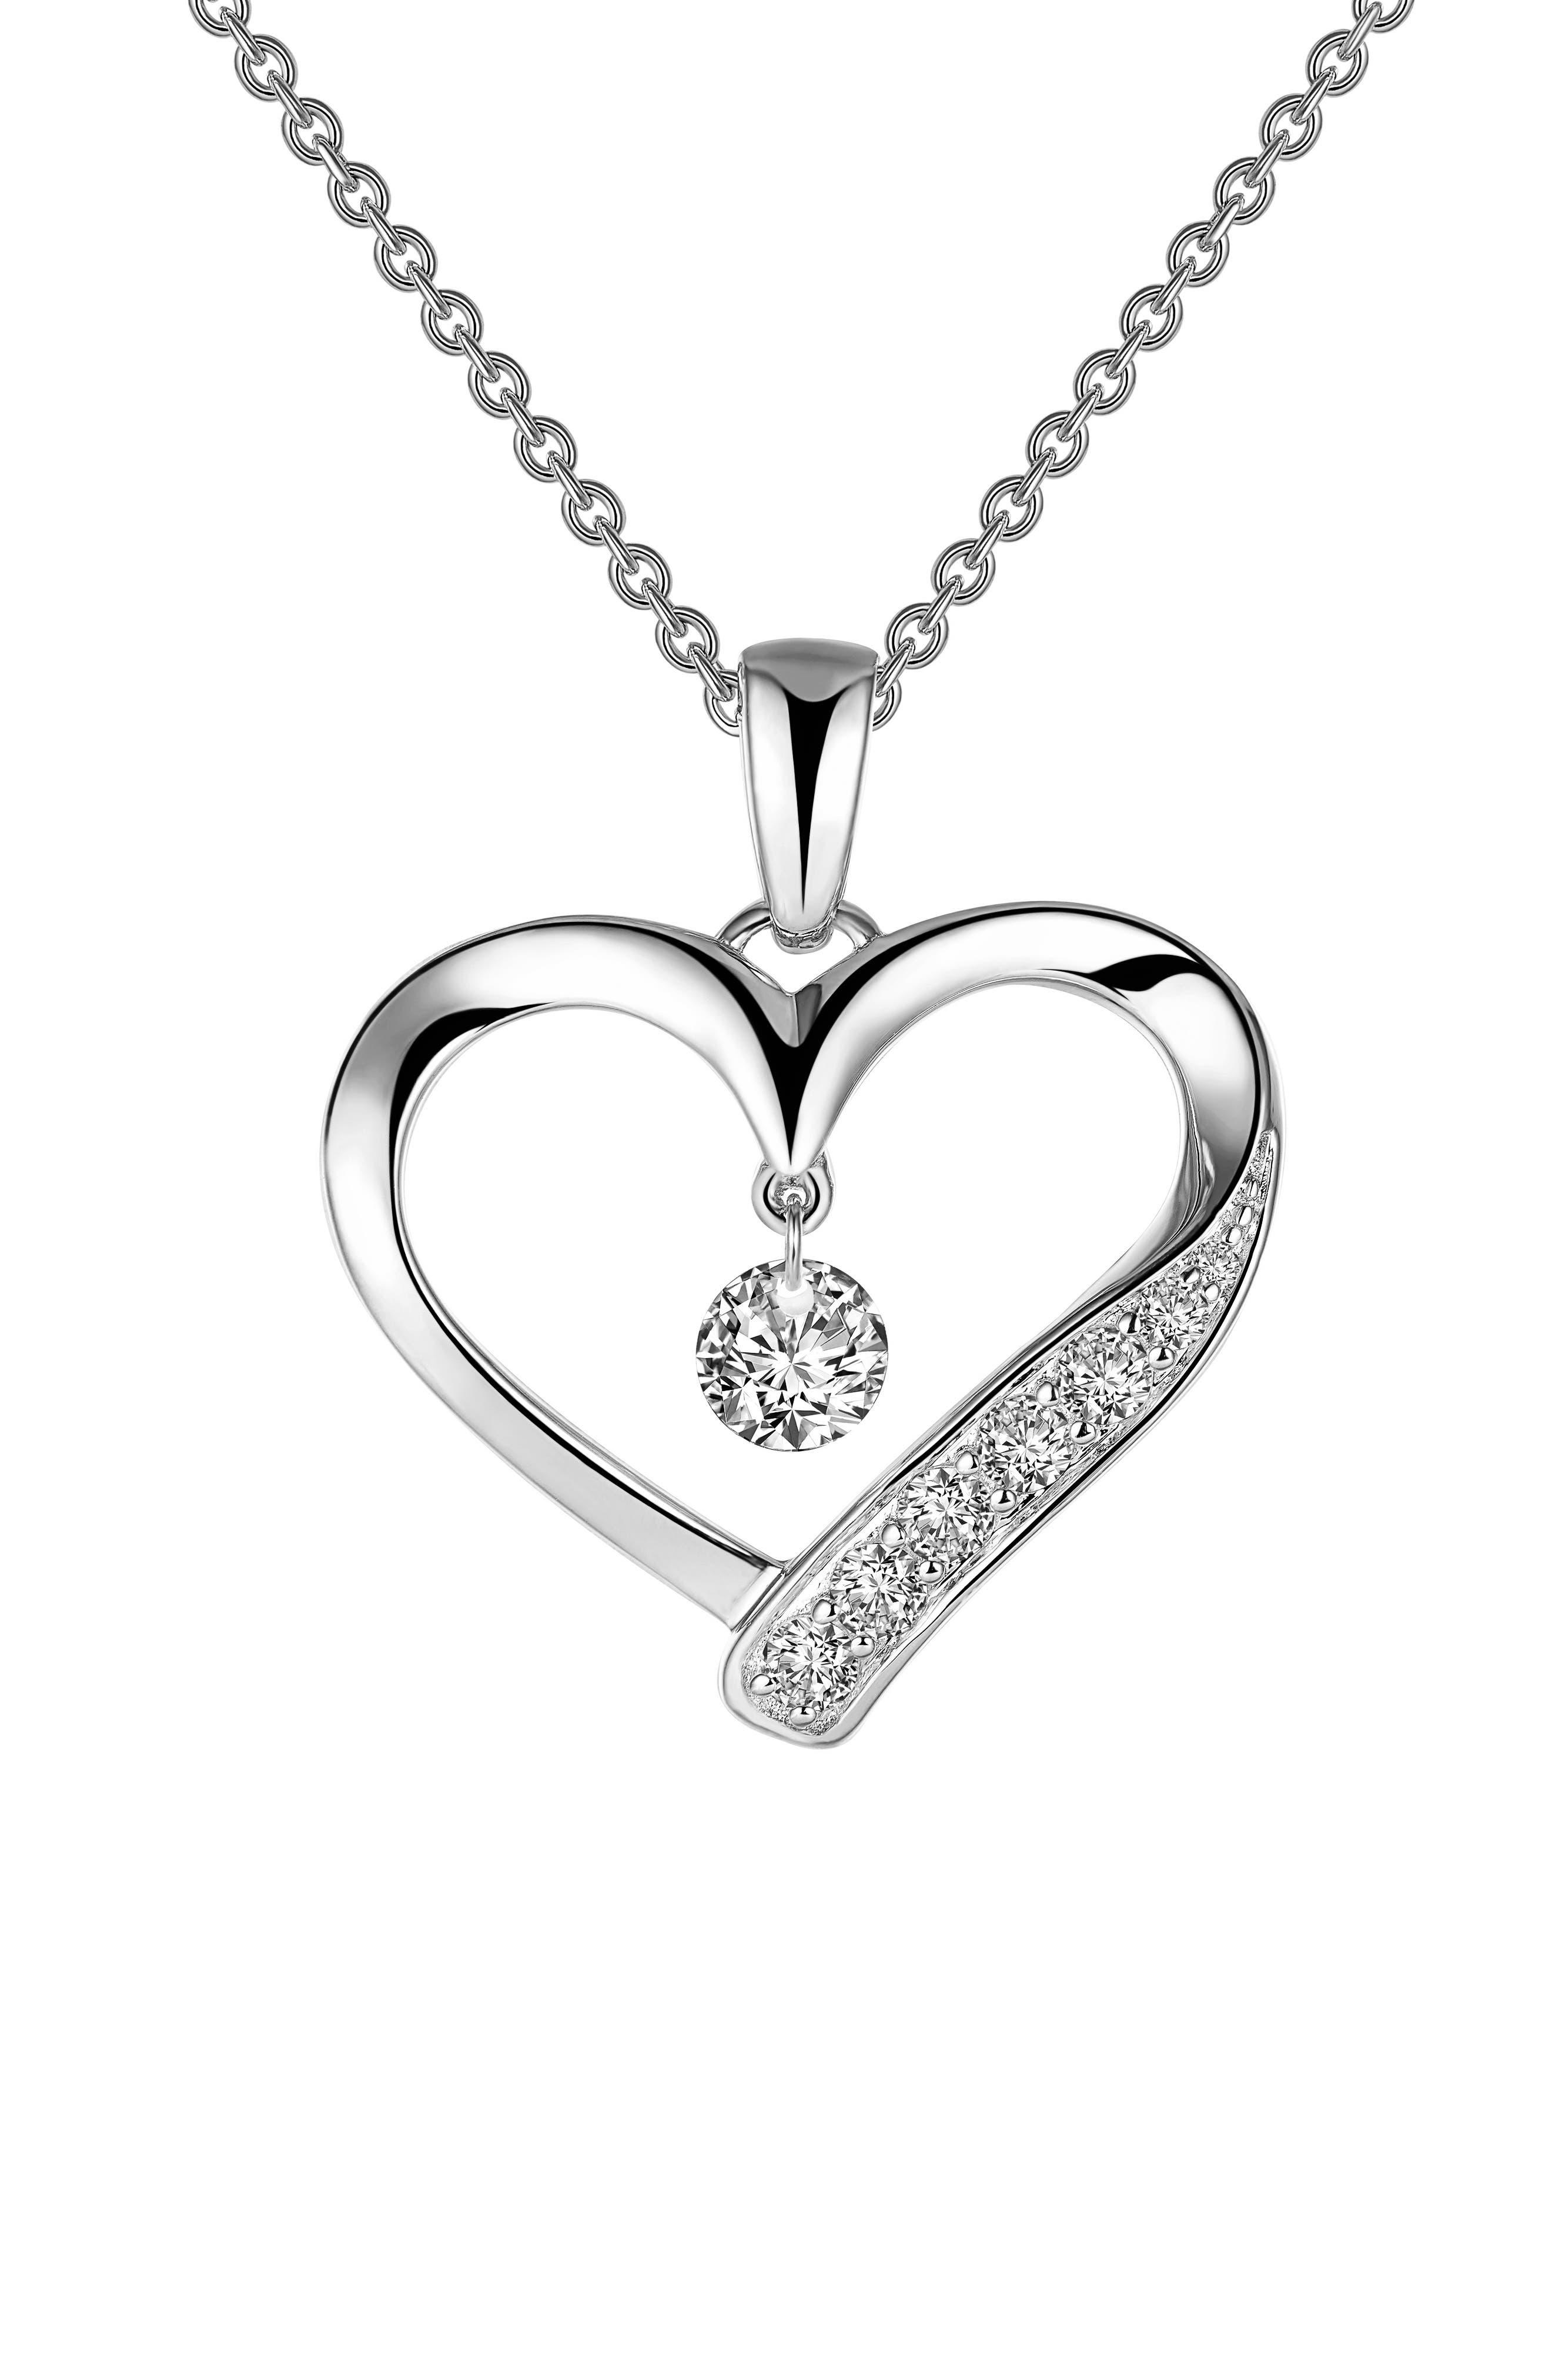 Heart Orbital Pendant Necklace